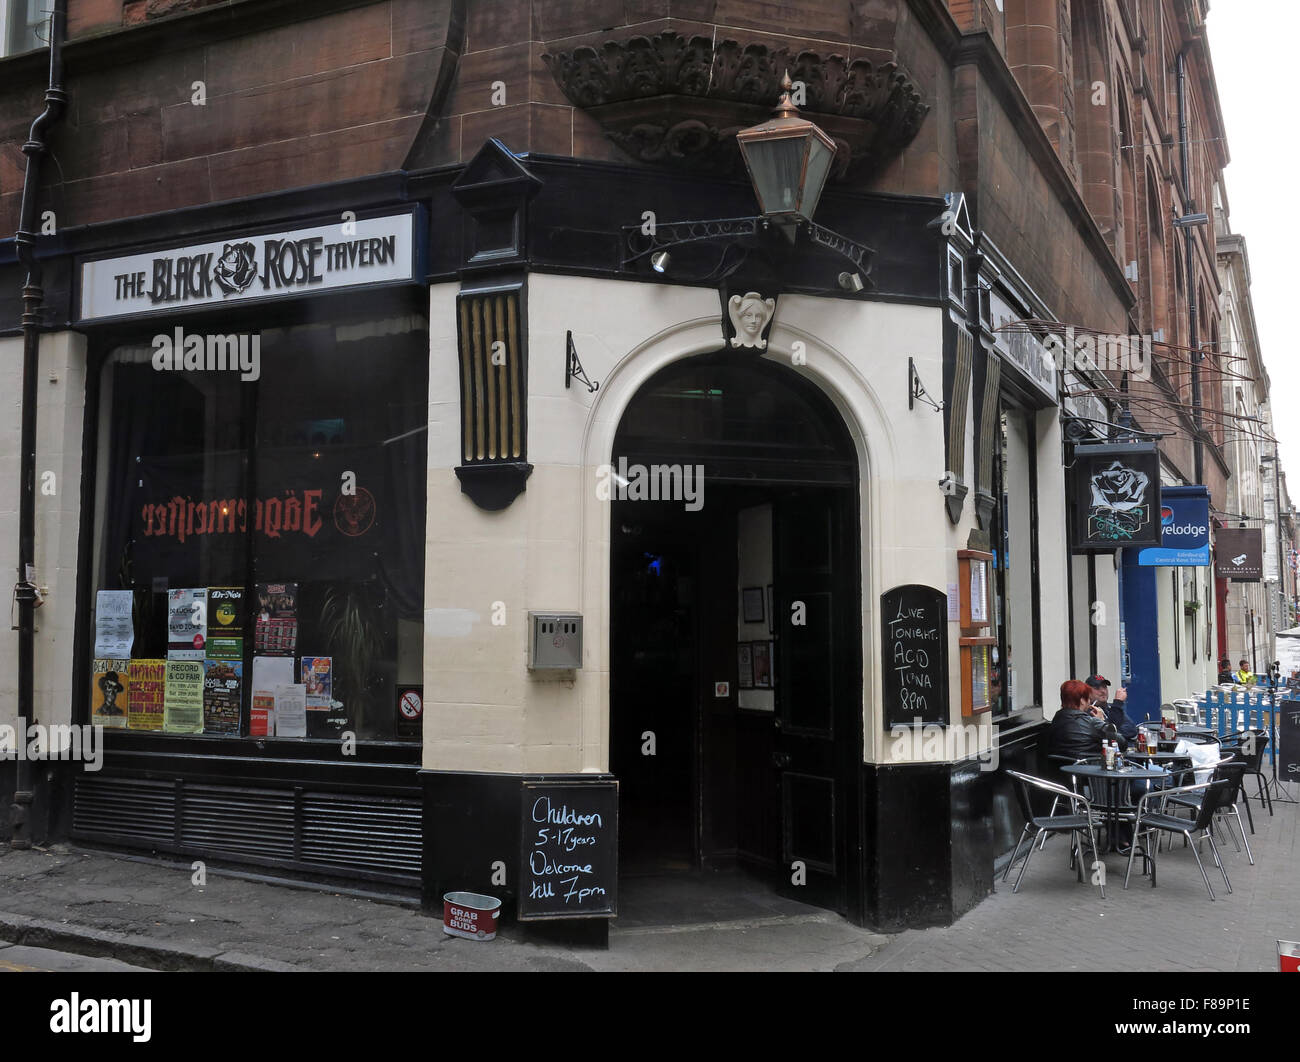 Black Rose Tavern,Pub Rose St,Edinburgh City Centre,Scotland,UK - Stock Image